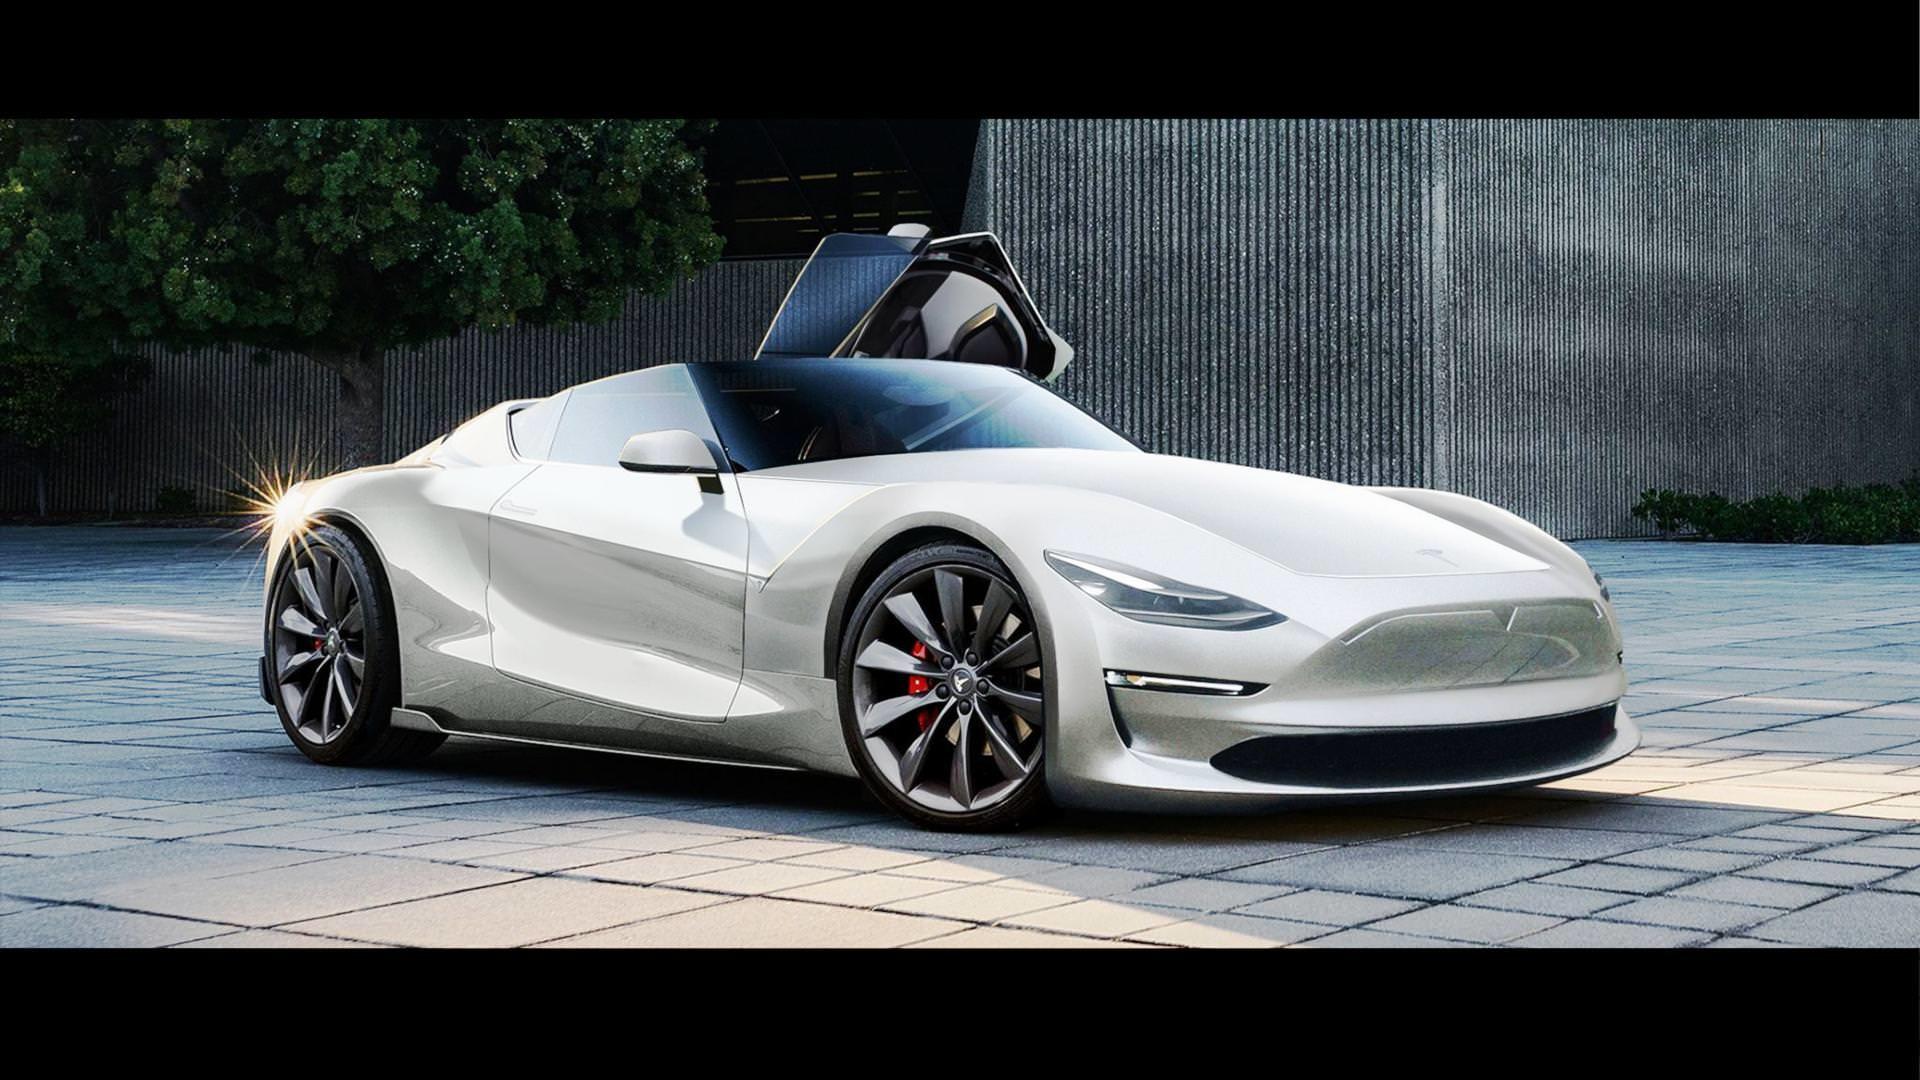 Tesla Roadster Wallpaper High Quality Resolution Tesla Sports Car 2019 1920x1080 Download Hd Wallpaper Wallpapertip